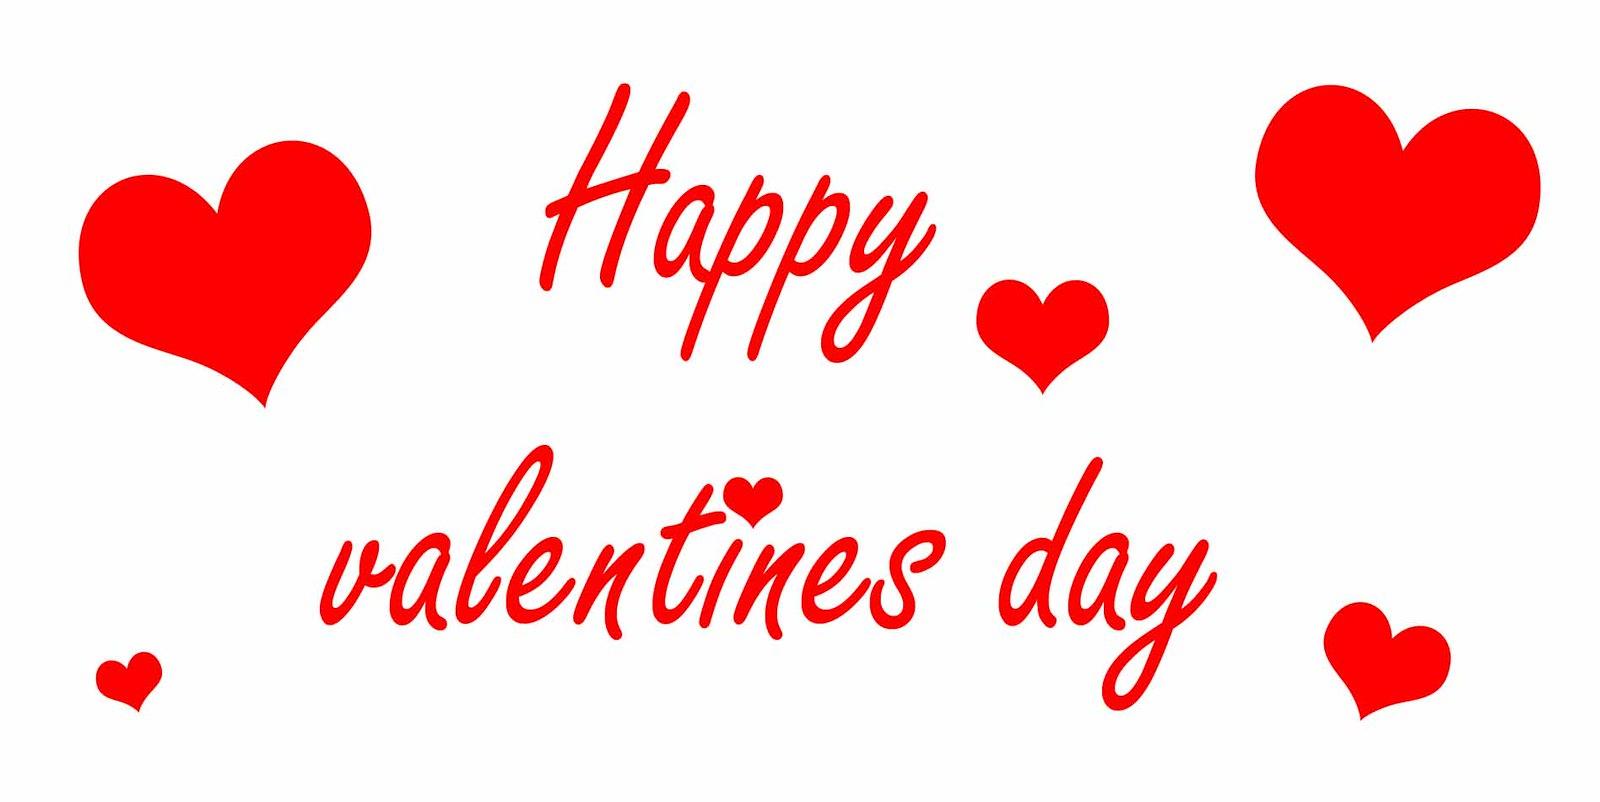 Valentinsdag - valentines day - menu